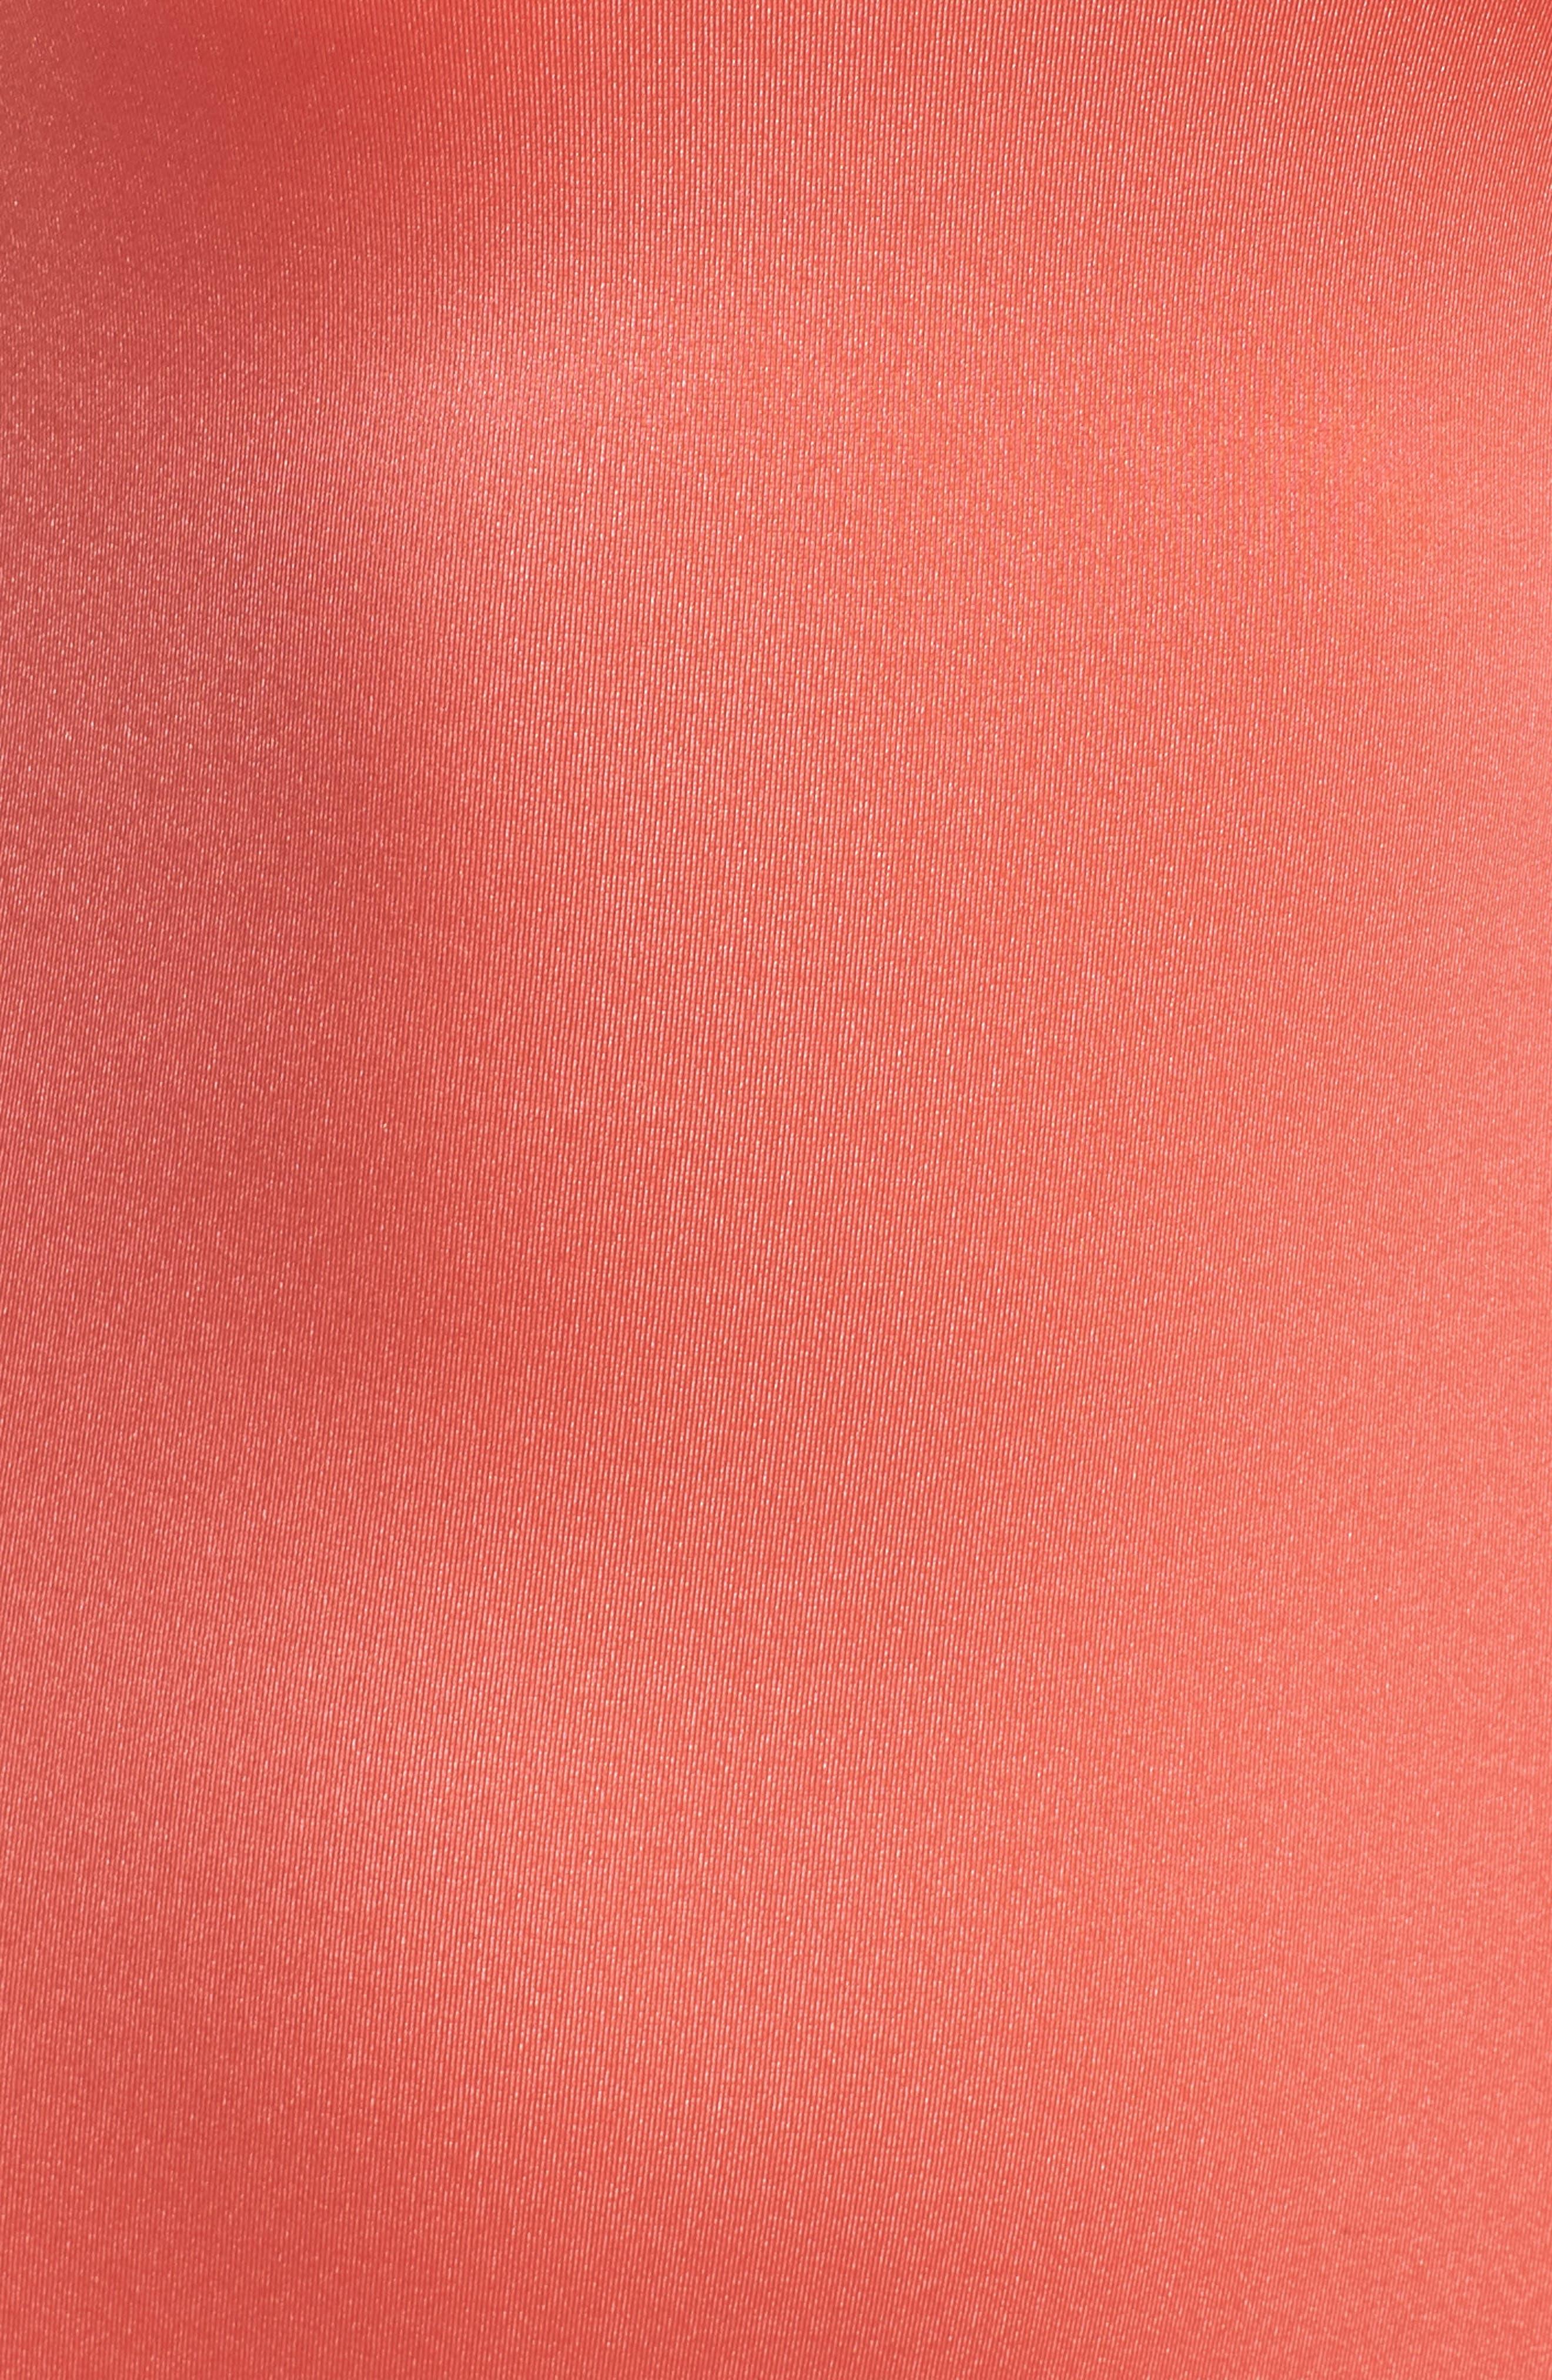 Retro One-Piece Swimsuit,                             Alternate thumbnail 5, color,                             Coral Glow